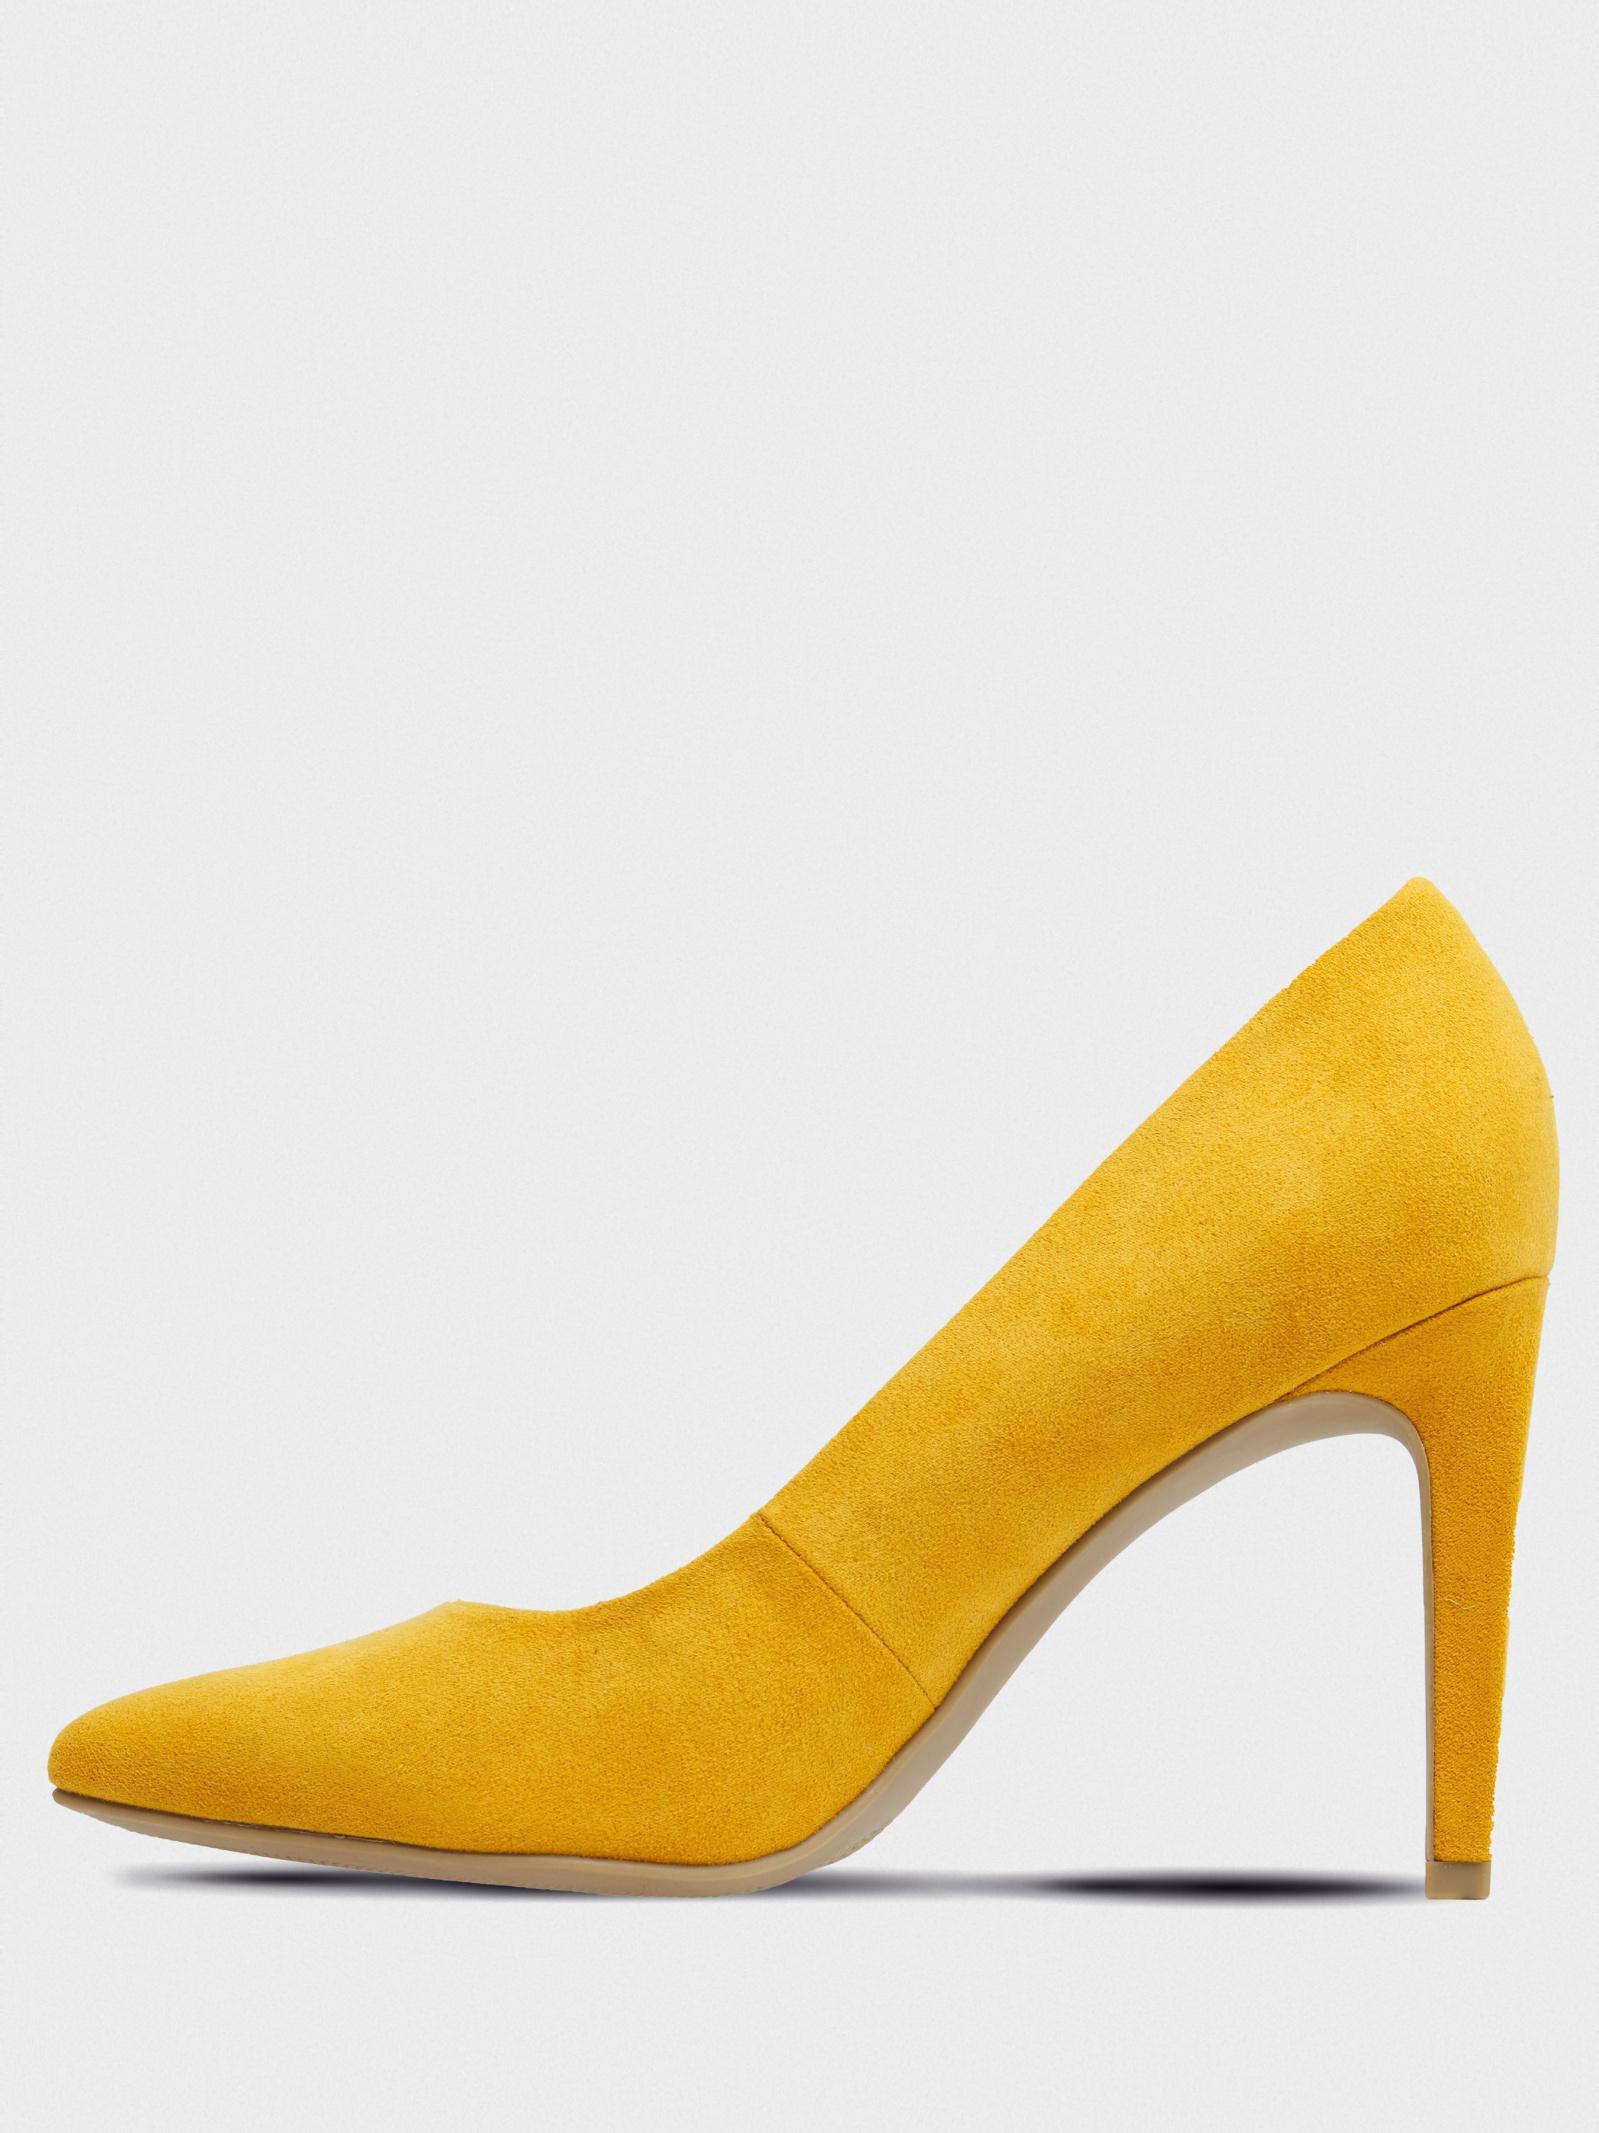 Туфли женские Marco Tozzi 3H342 брендовые, 2017